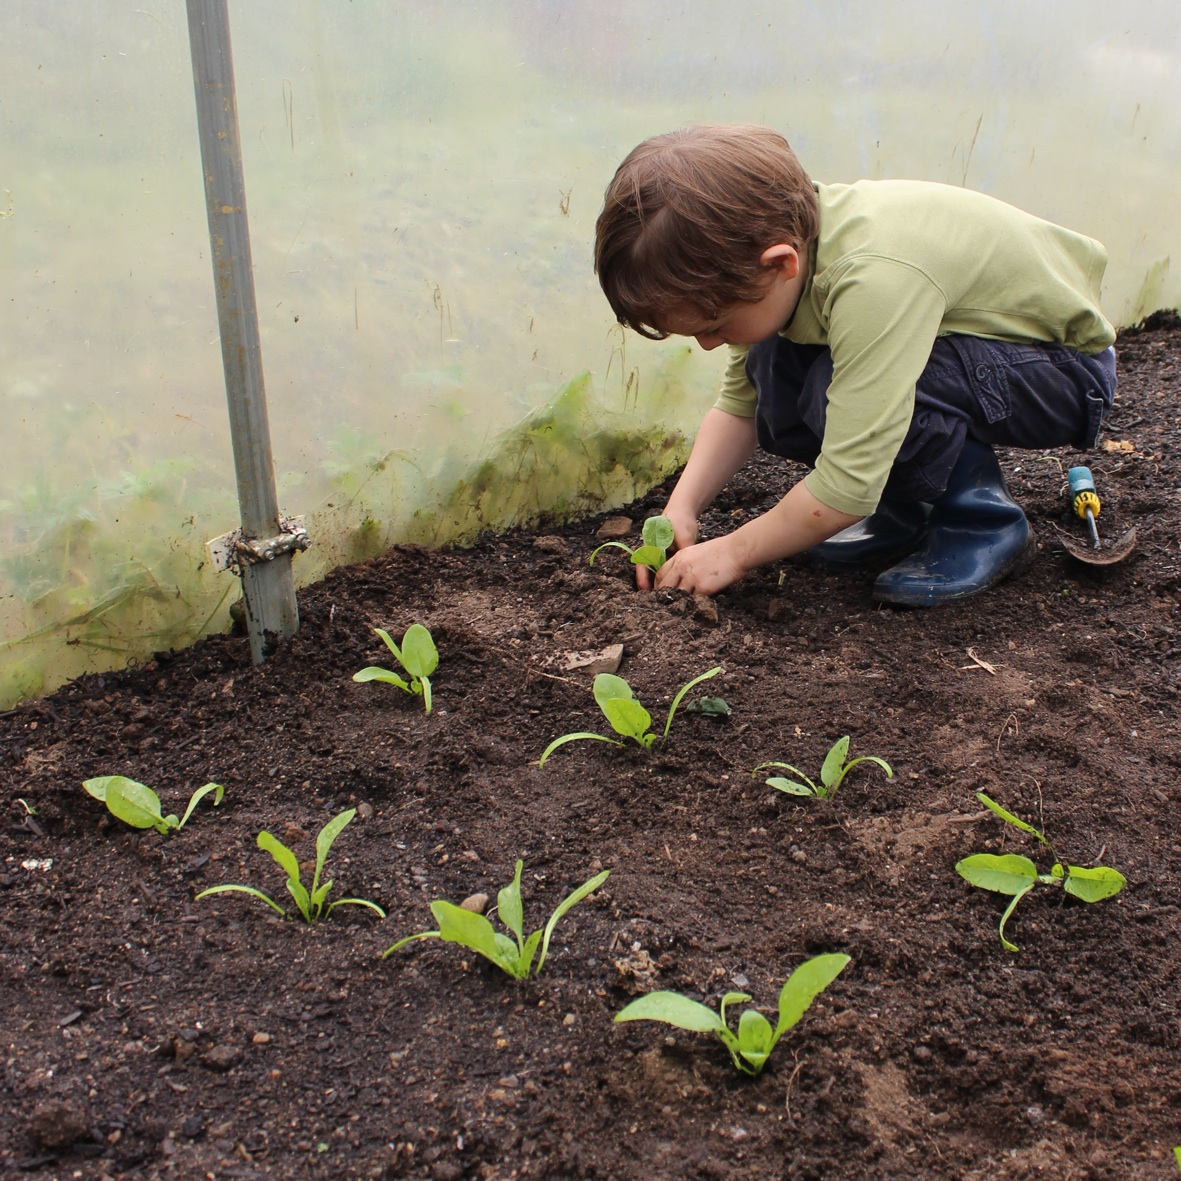 Small-boy-planting-seedlings